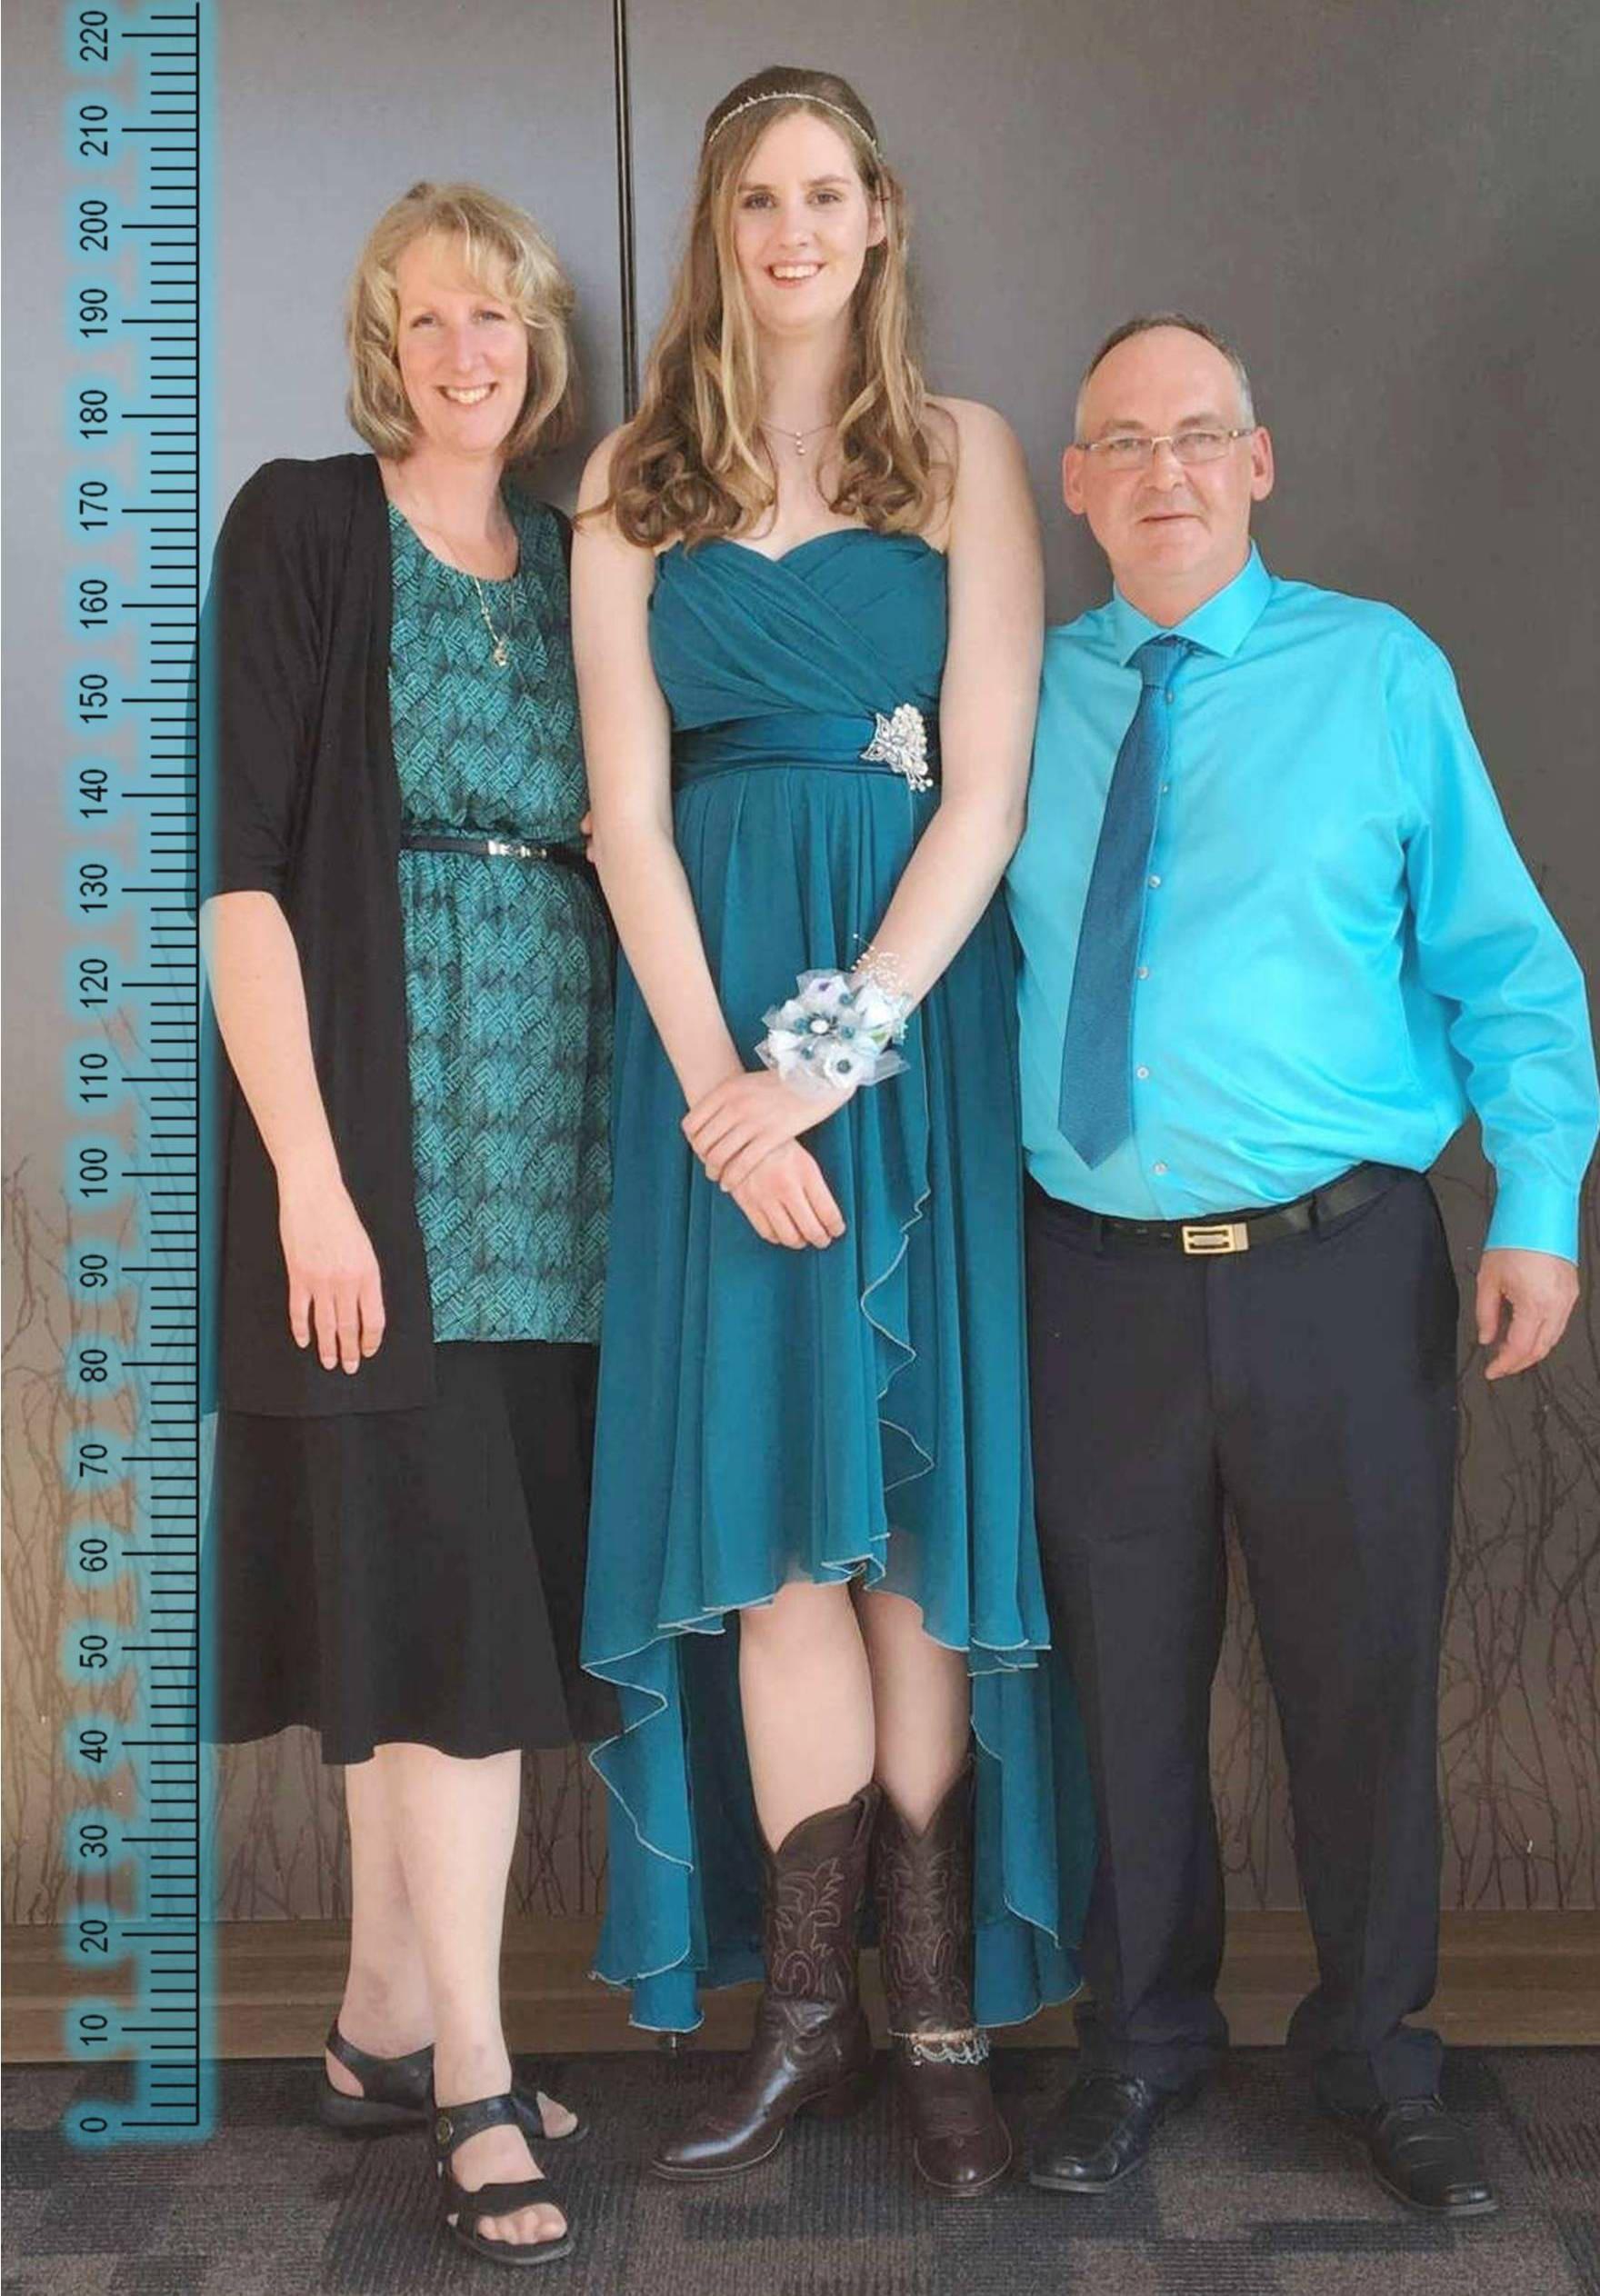 6ft11 5 212cm Tall By Zaratustraelsabio Tall Women Tall People Women With Beautiful Legs